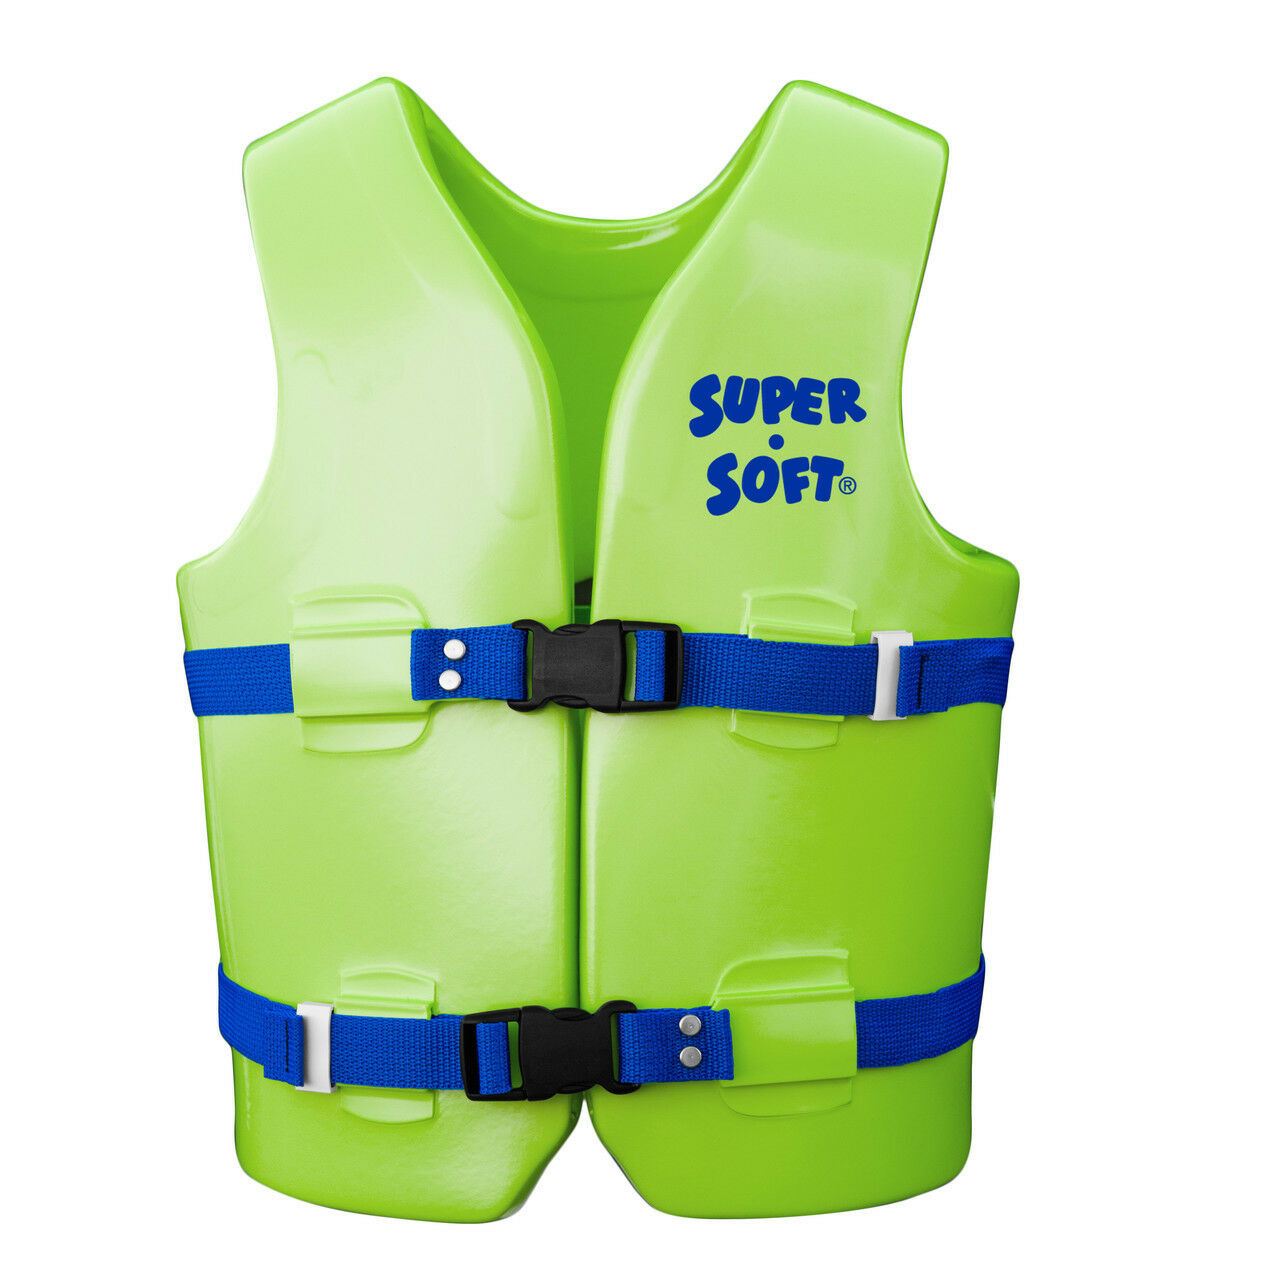 TRC Recreation Super Soft USCG Youth Medium Swim Vest, Kool Lime Green